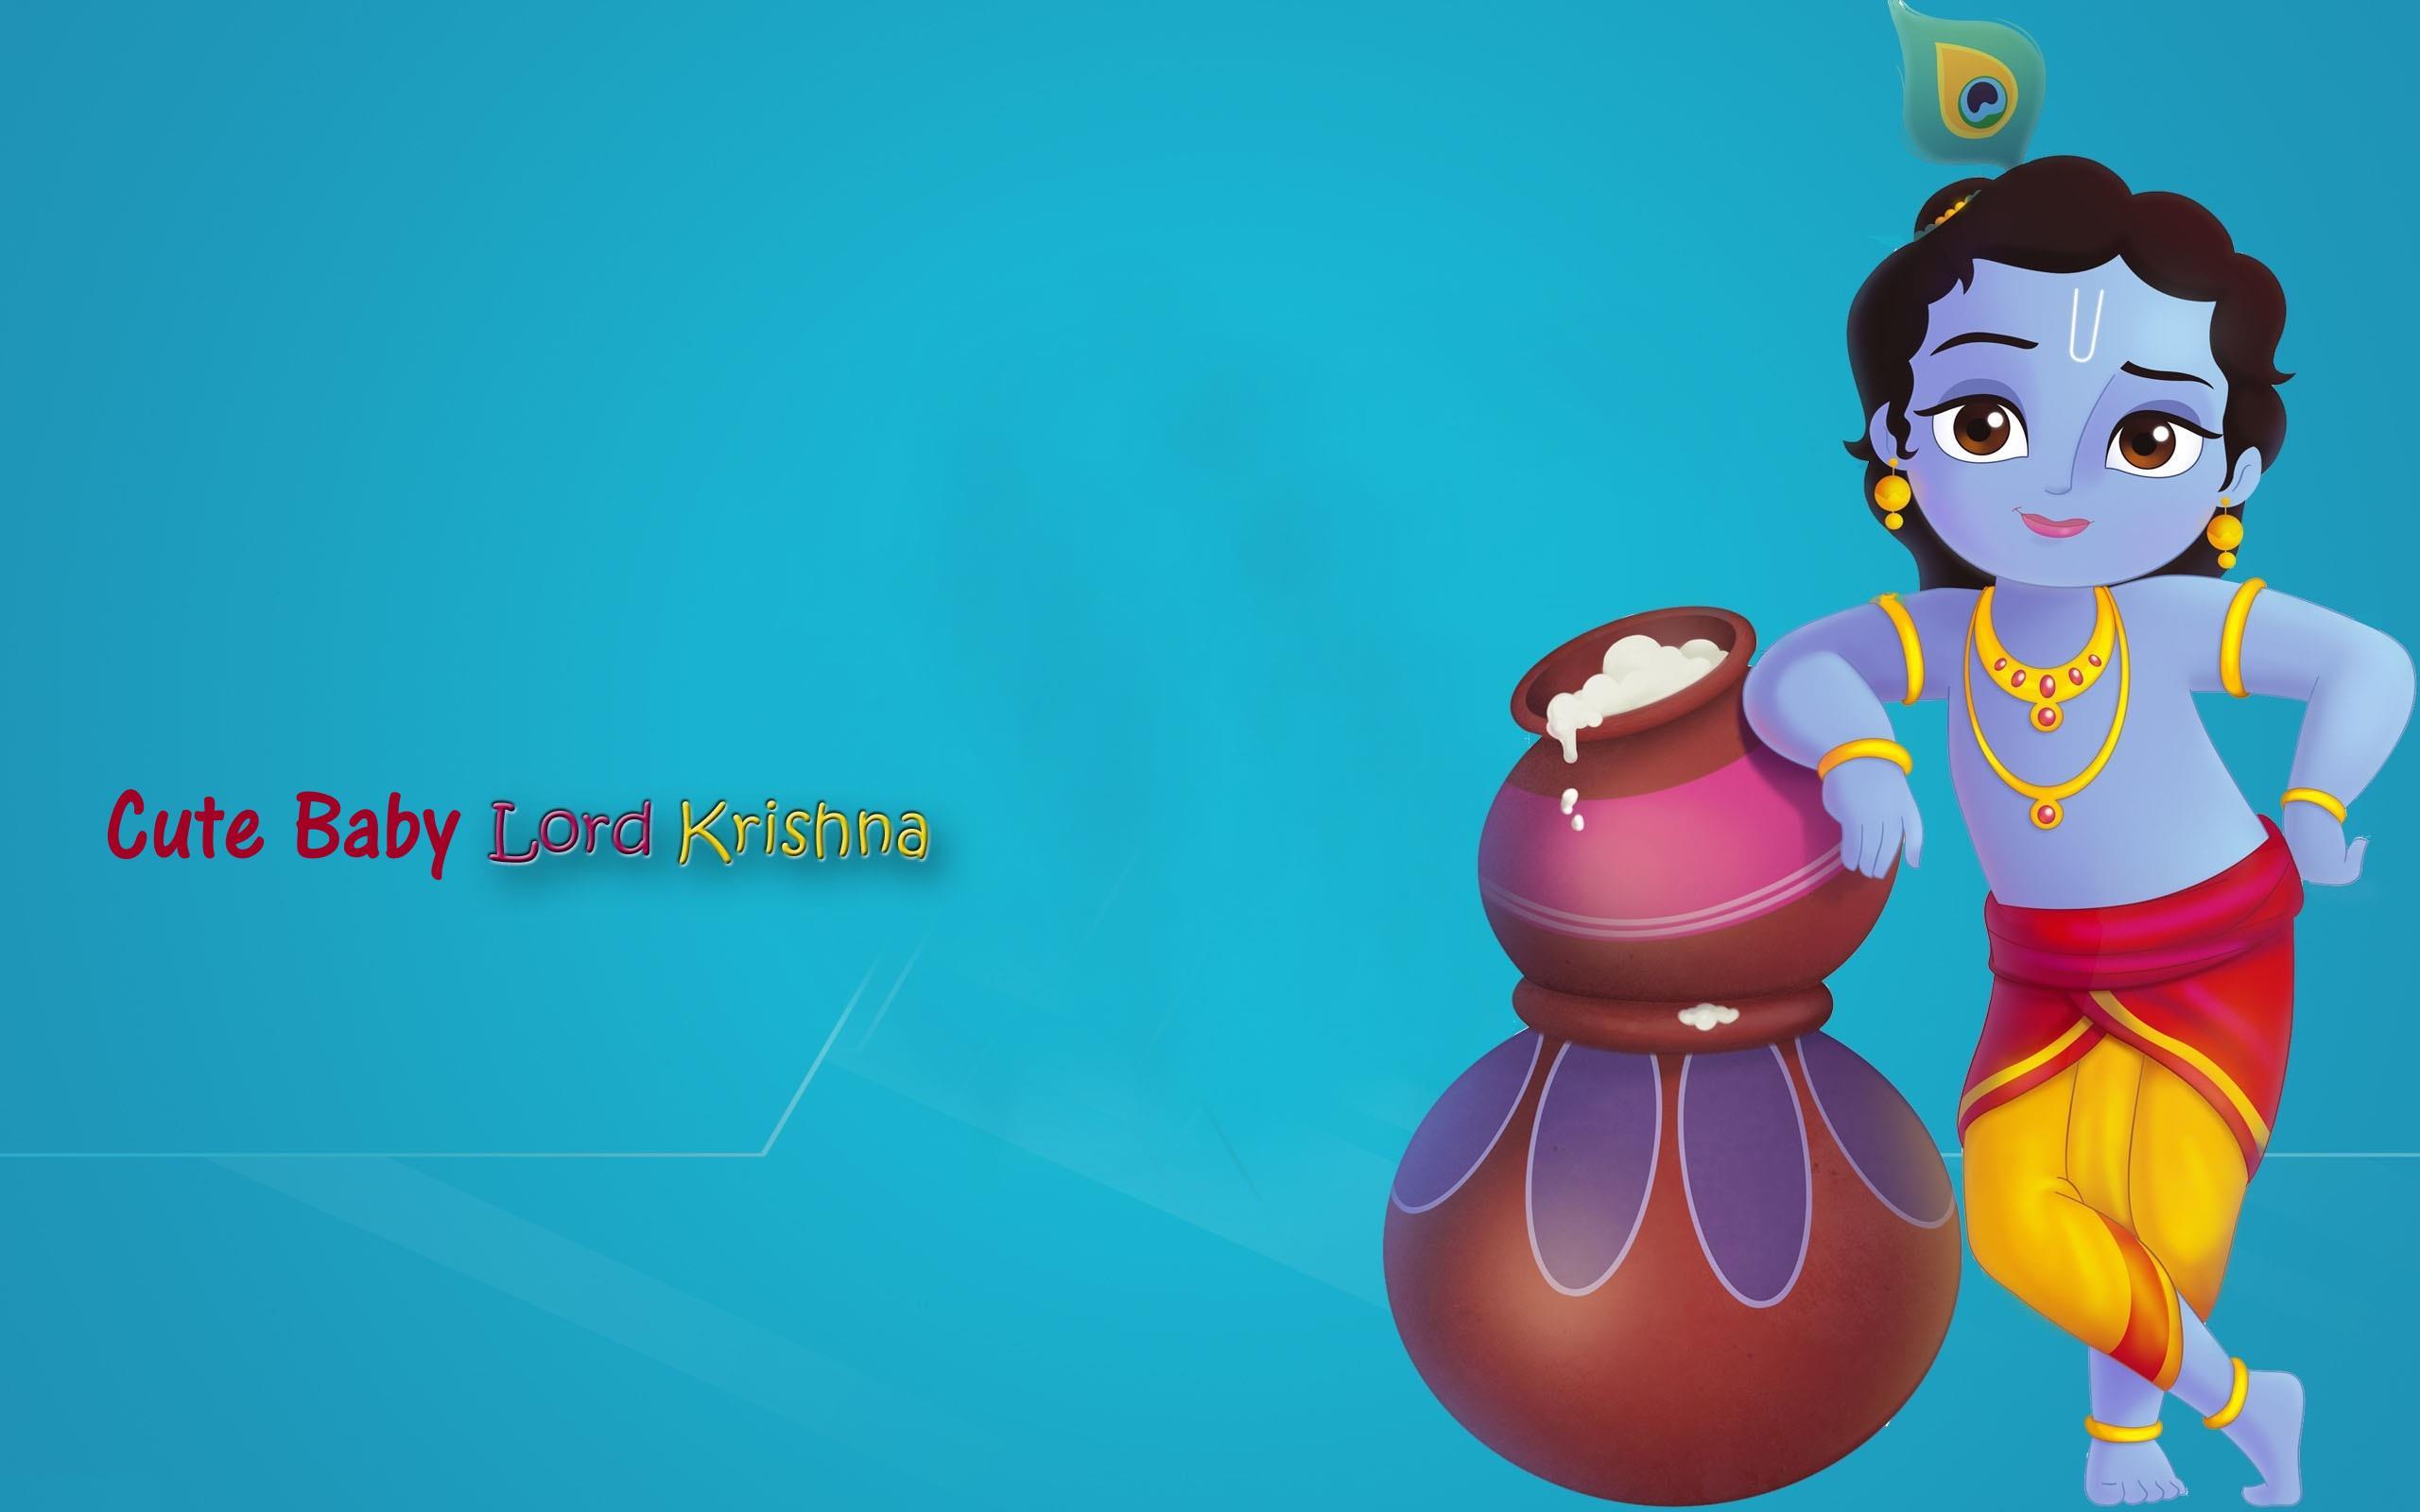 Cute Baby Lord Krishna wallpaper HD on Janamashatami